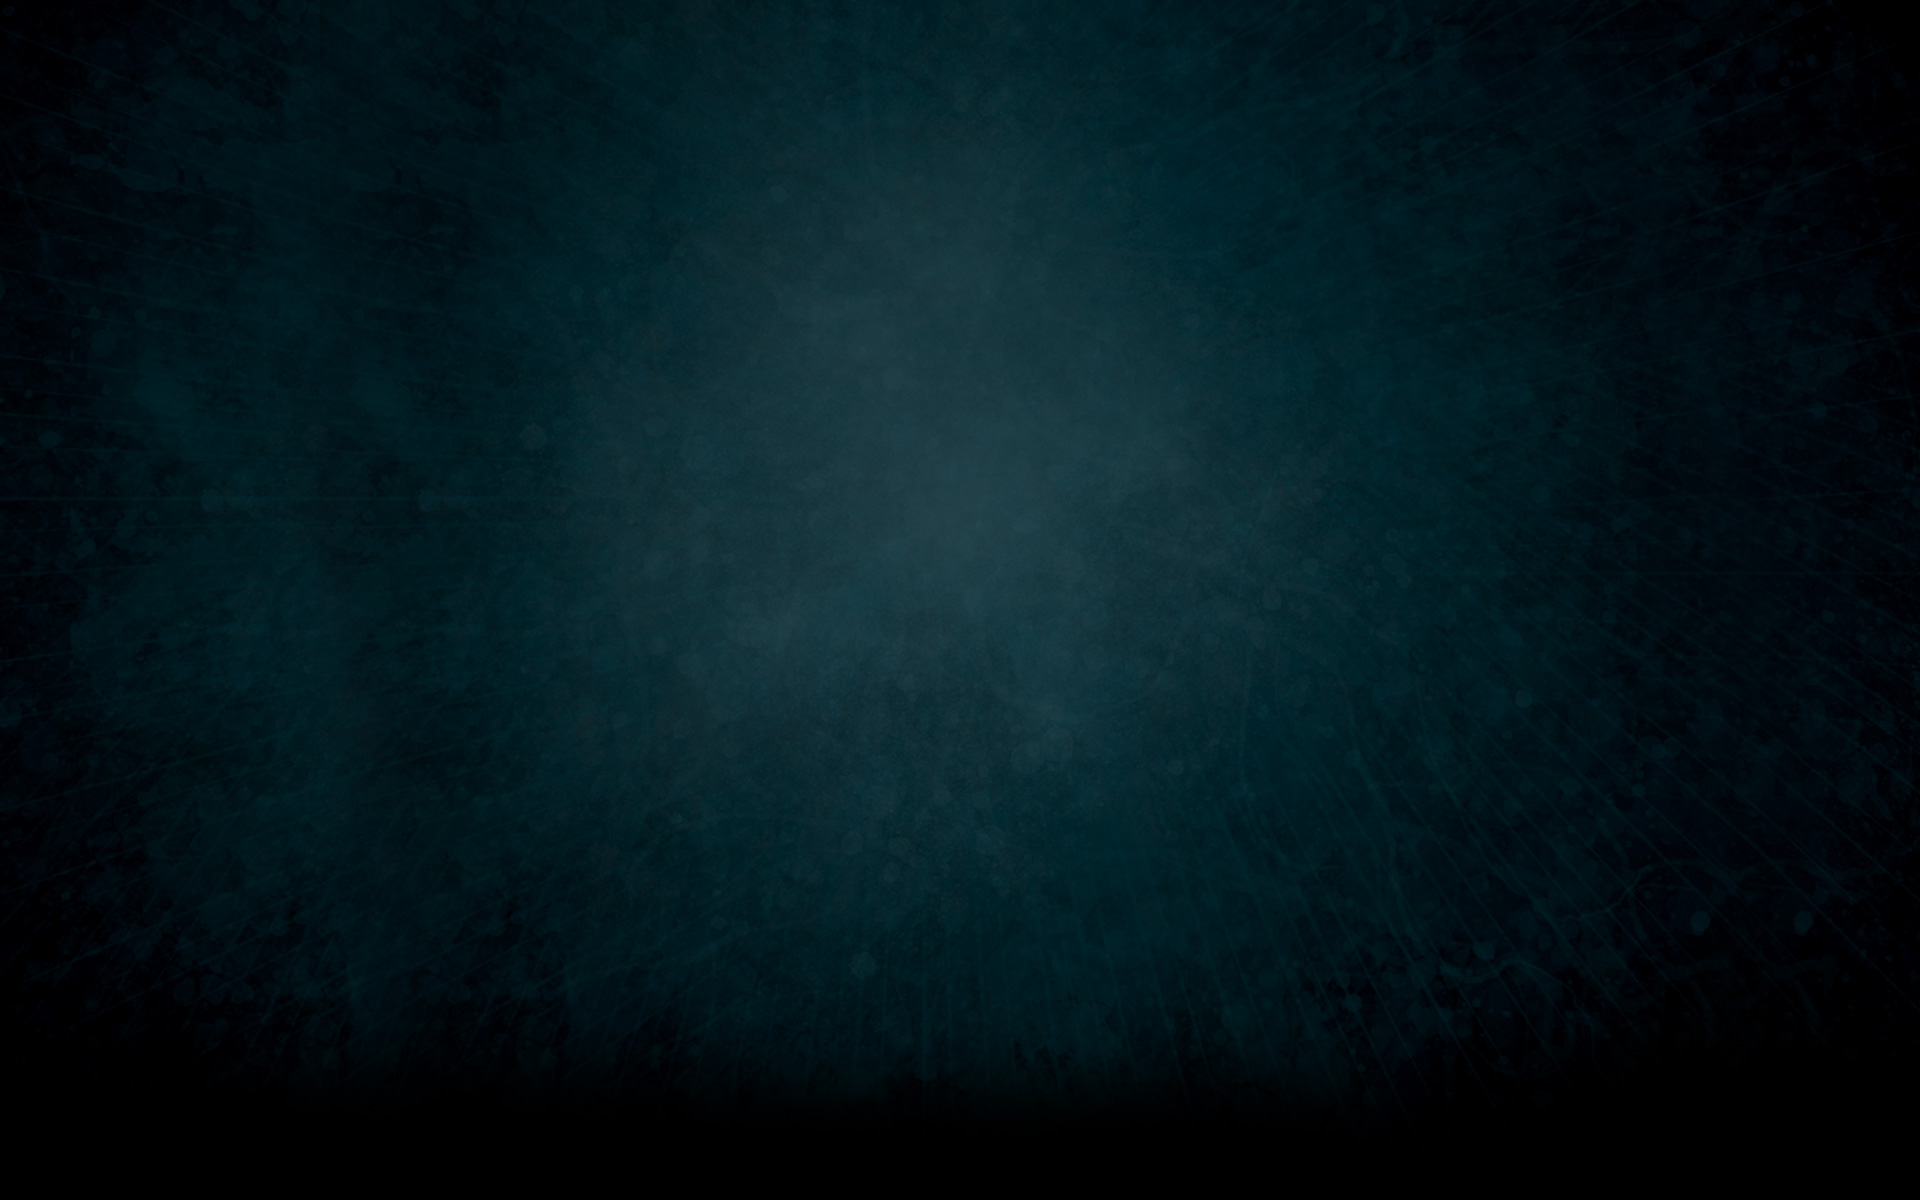 [48+] Navy Blue HD Wallpaper on WallpaperSafari